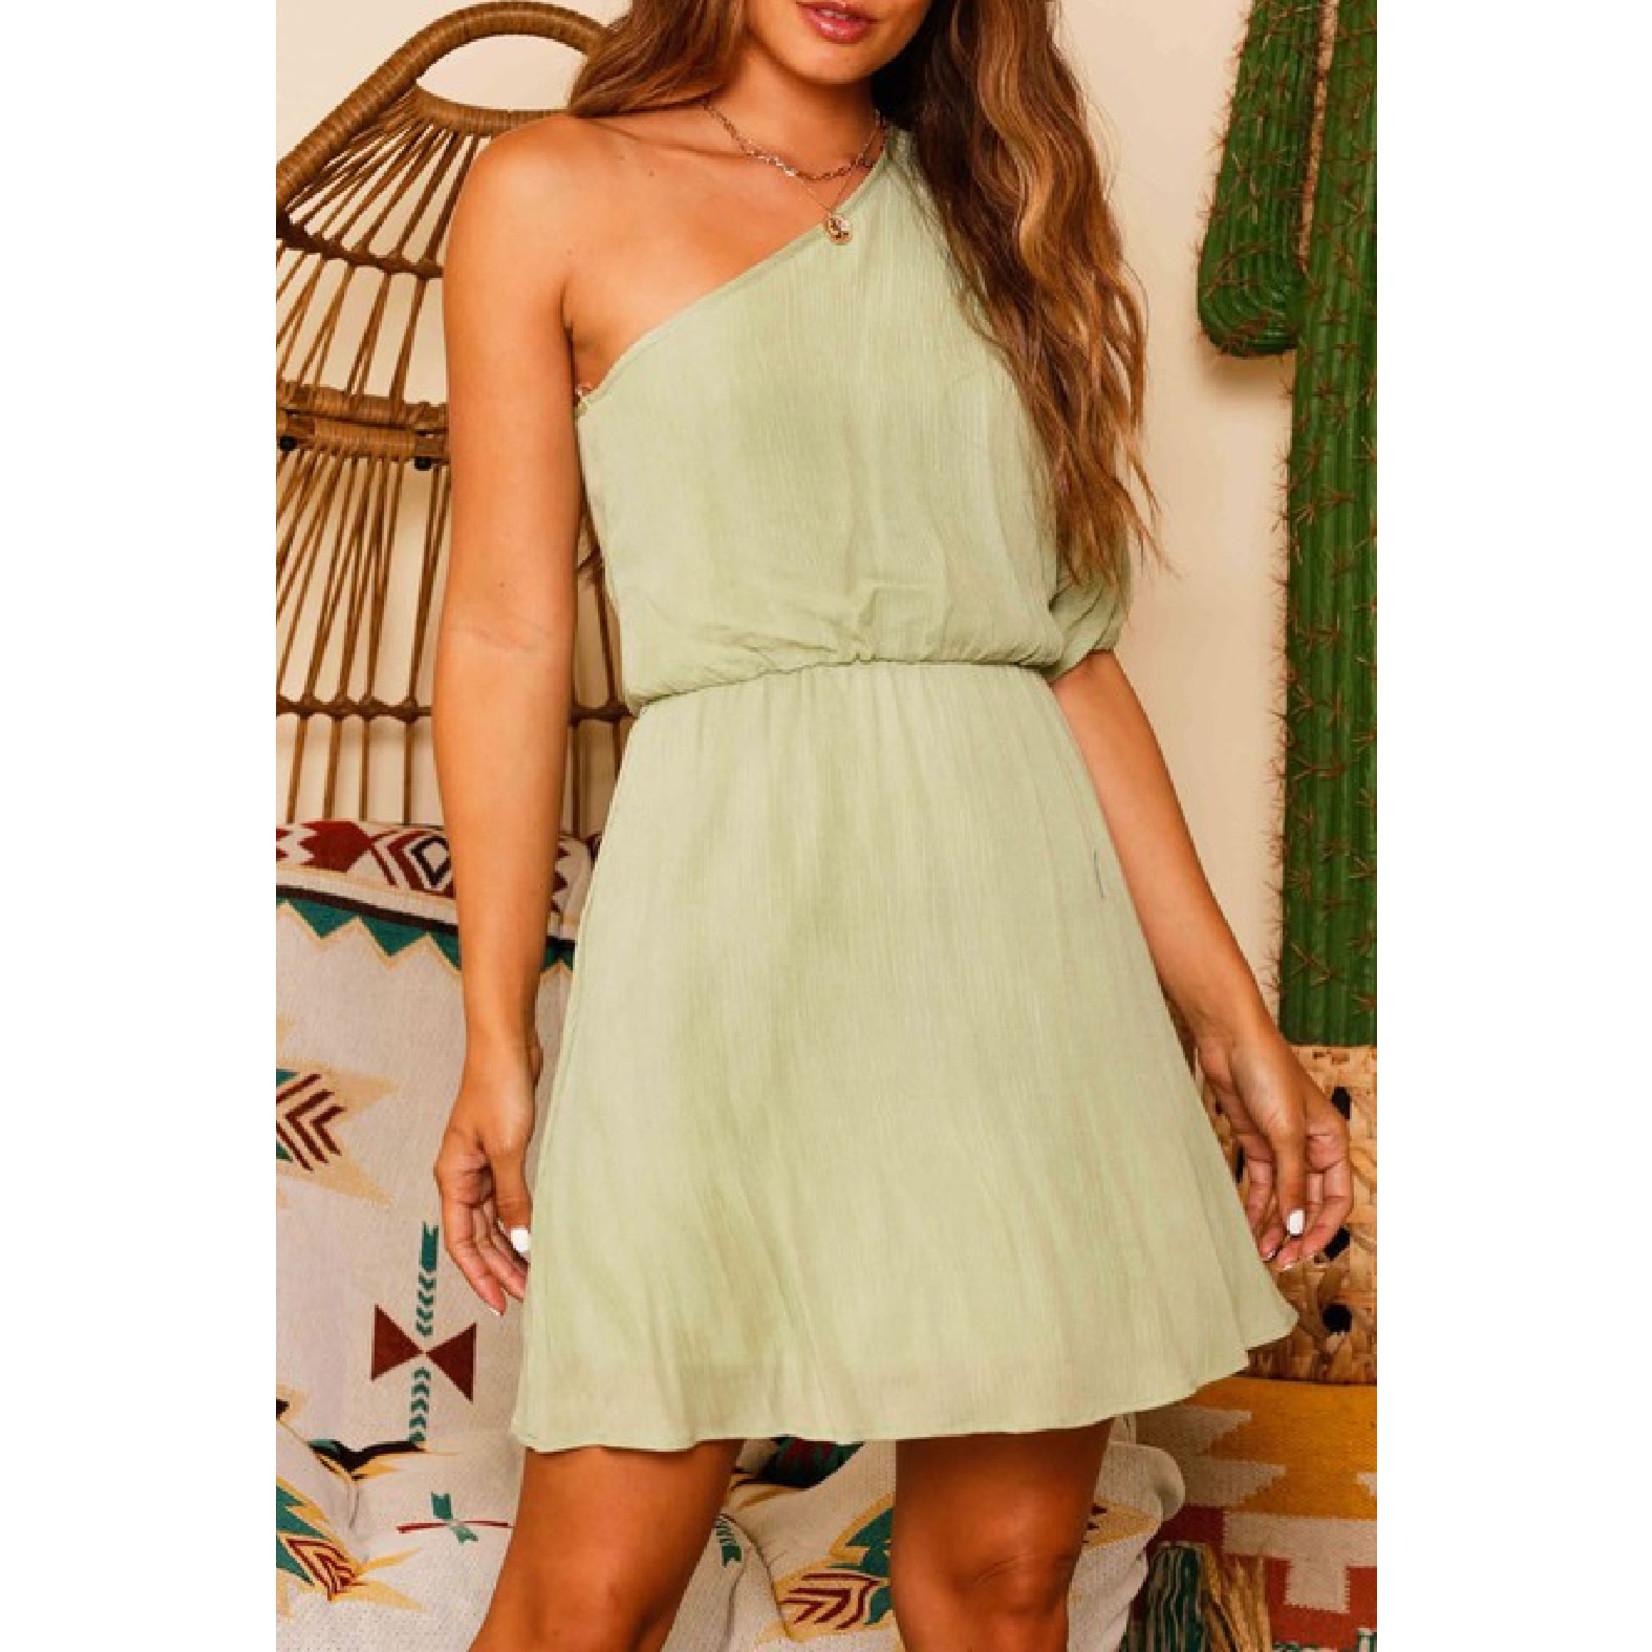 Fantastic Fawn One Shoulder Half Sleeve dress